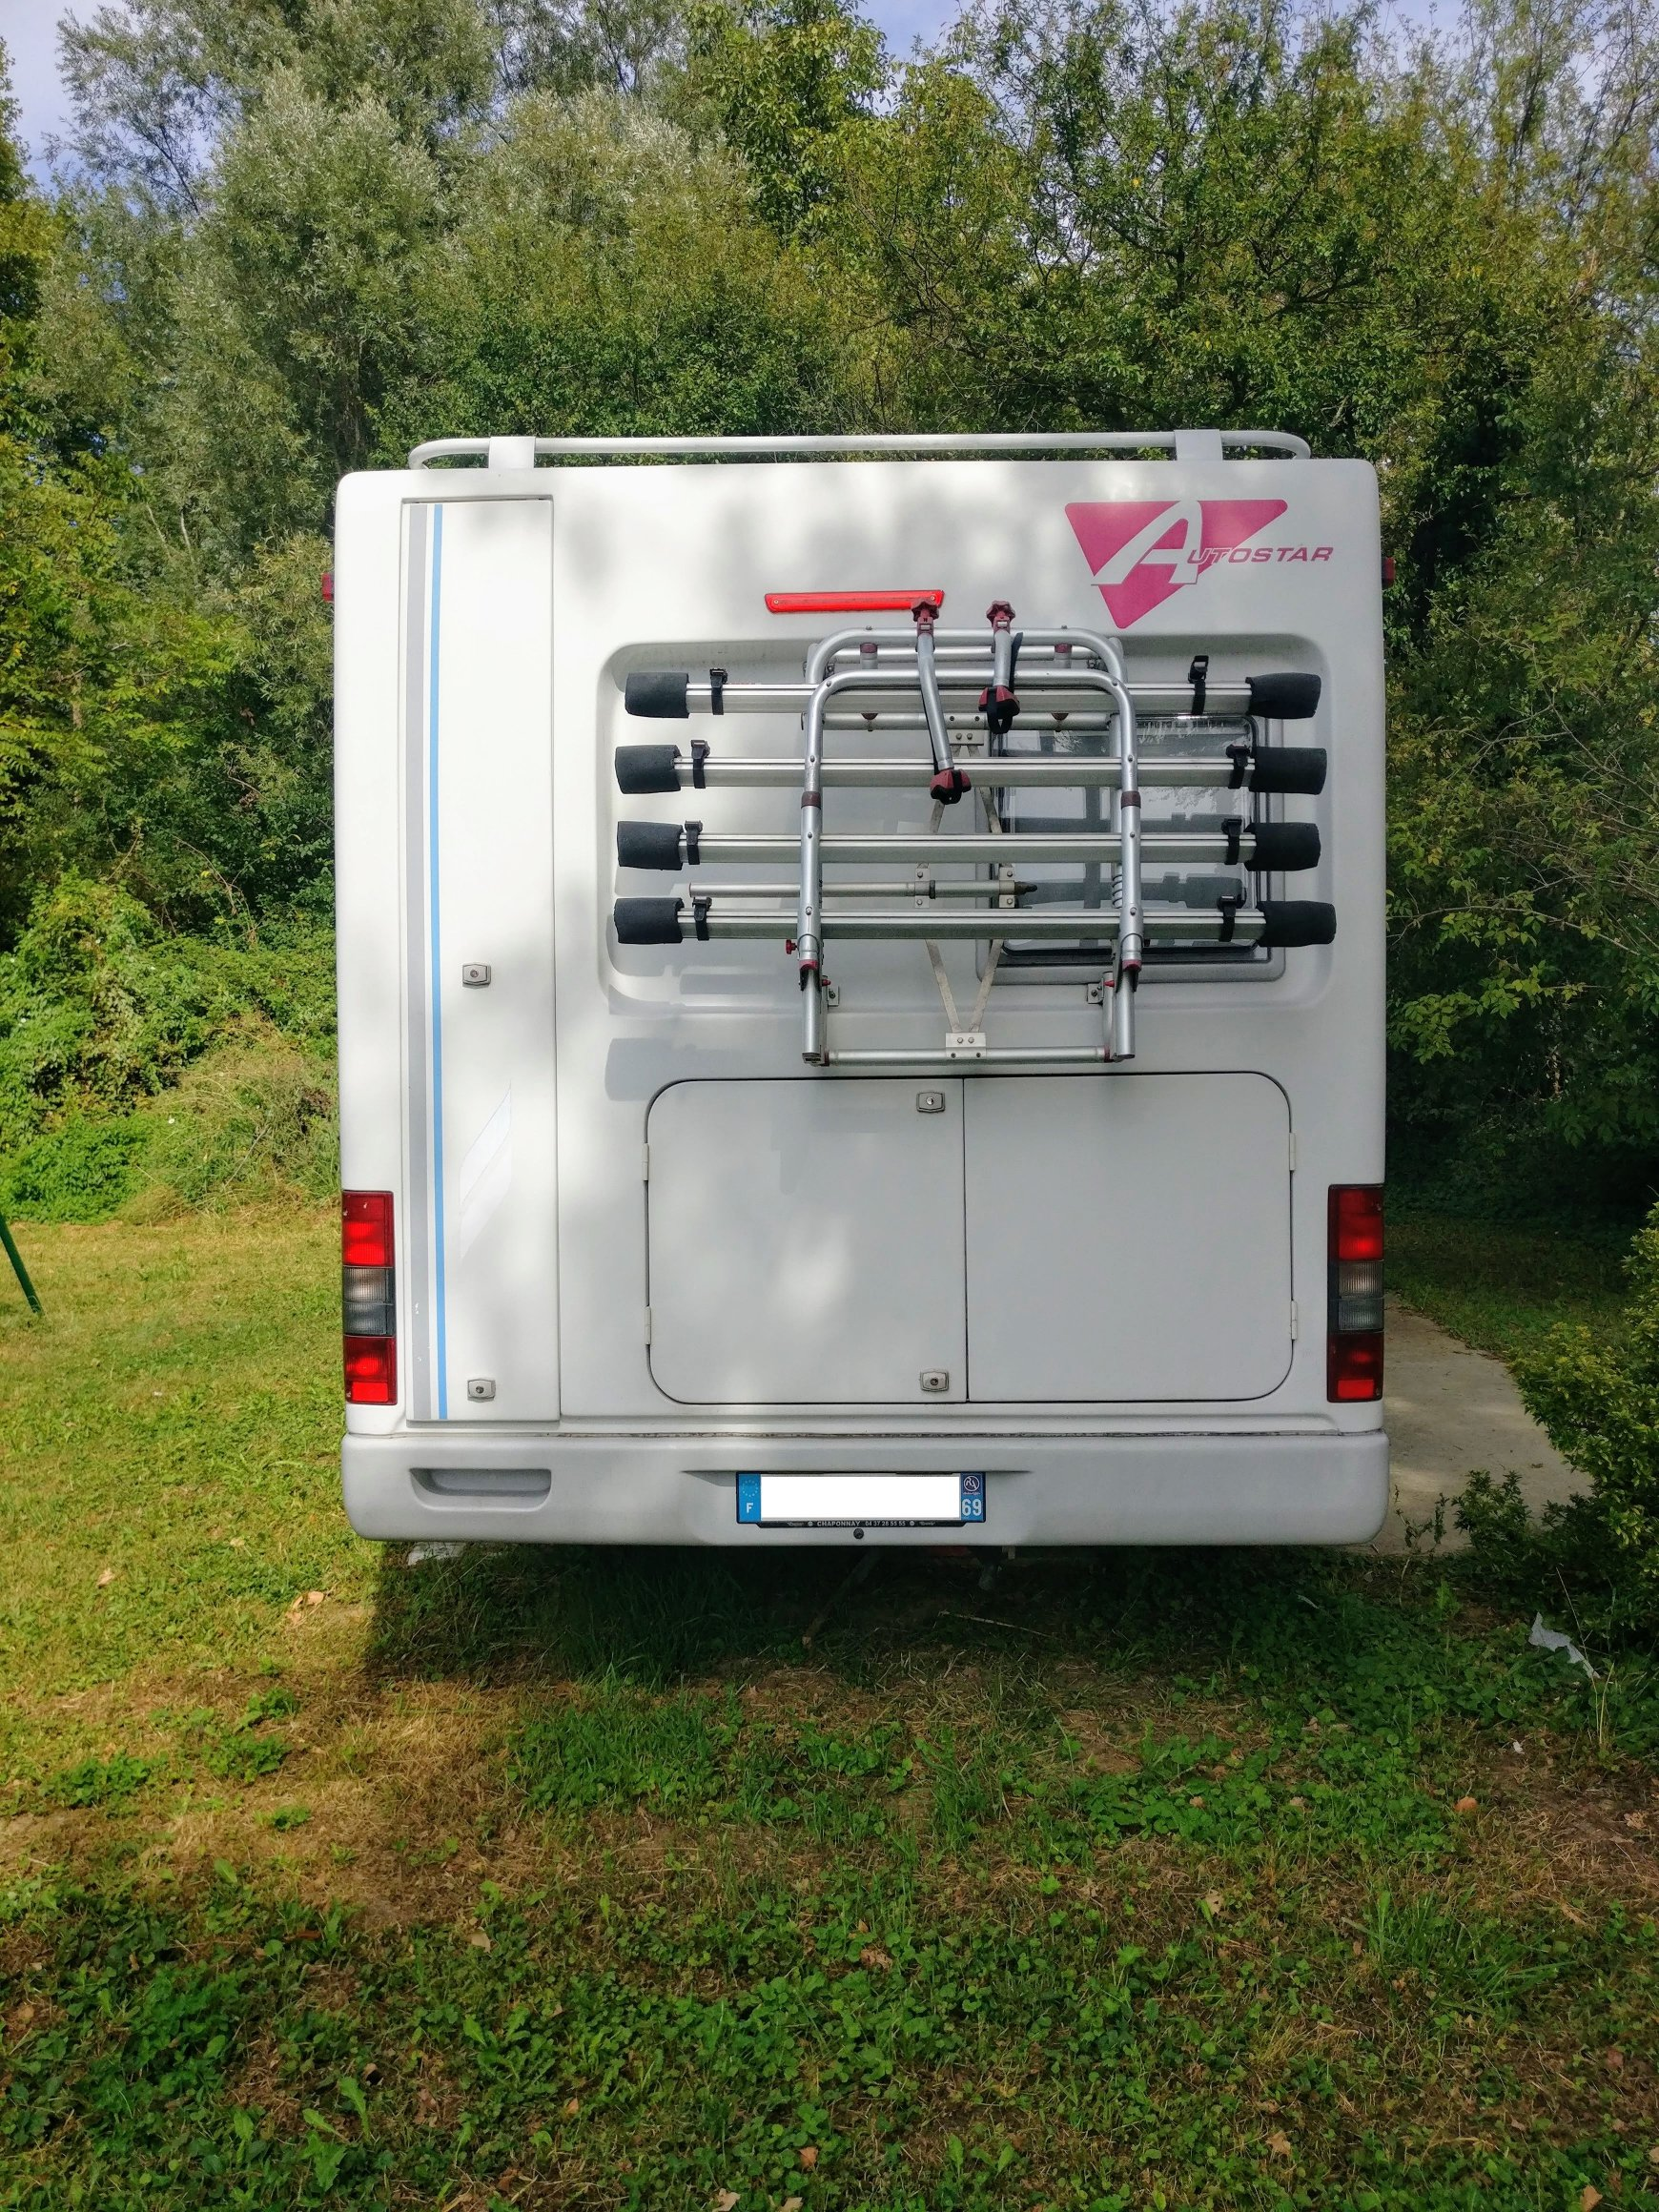 camping-car AUTOSTAR ATHENOR 547  intérieur / coin salon